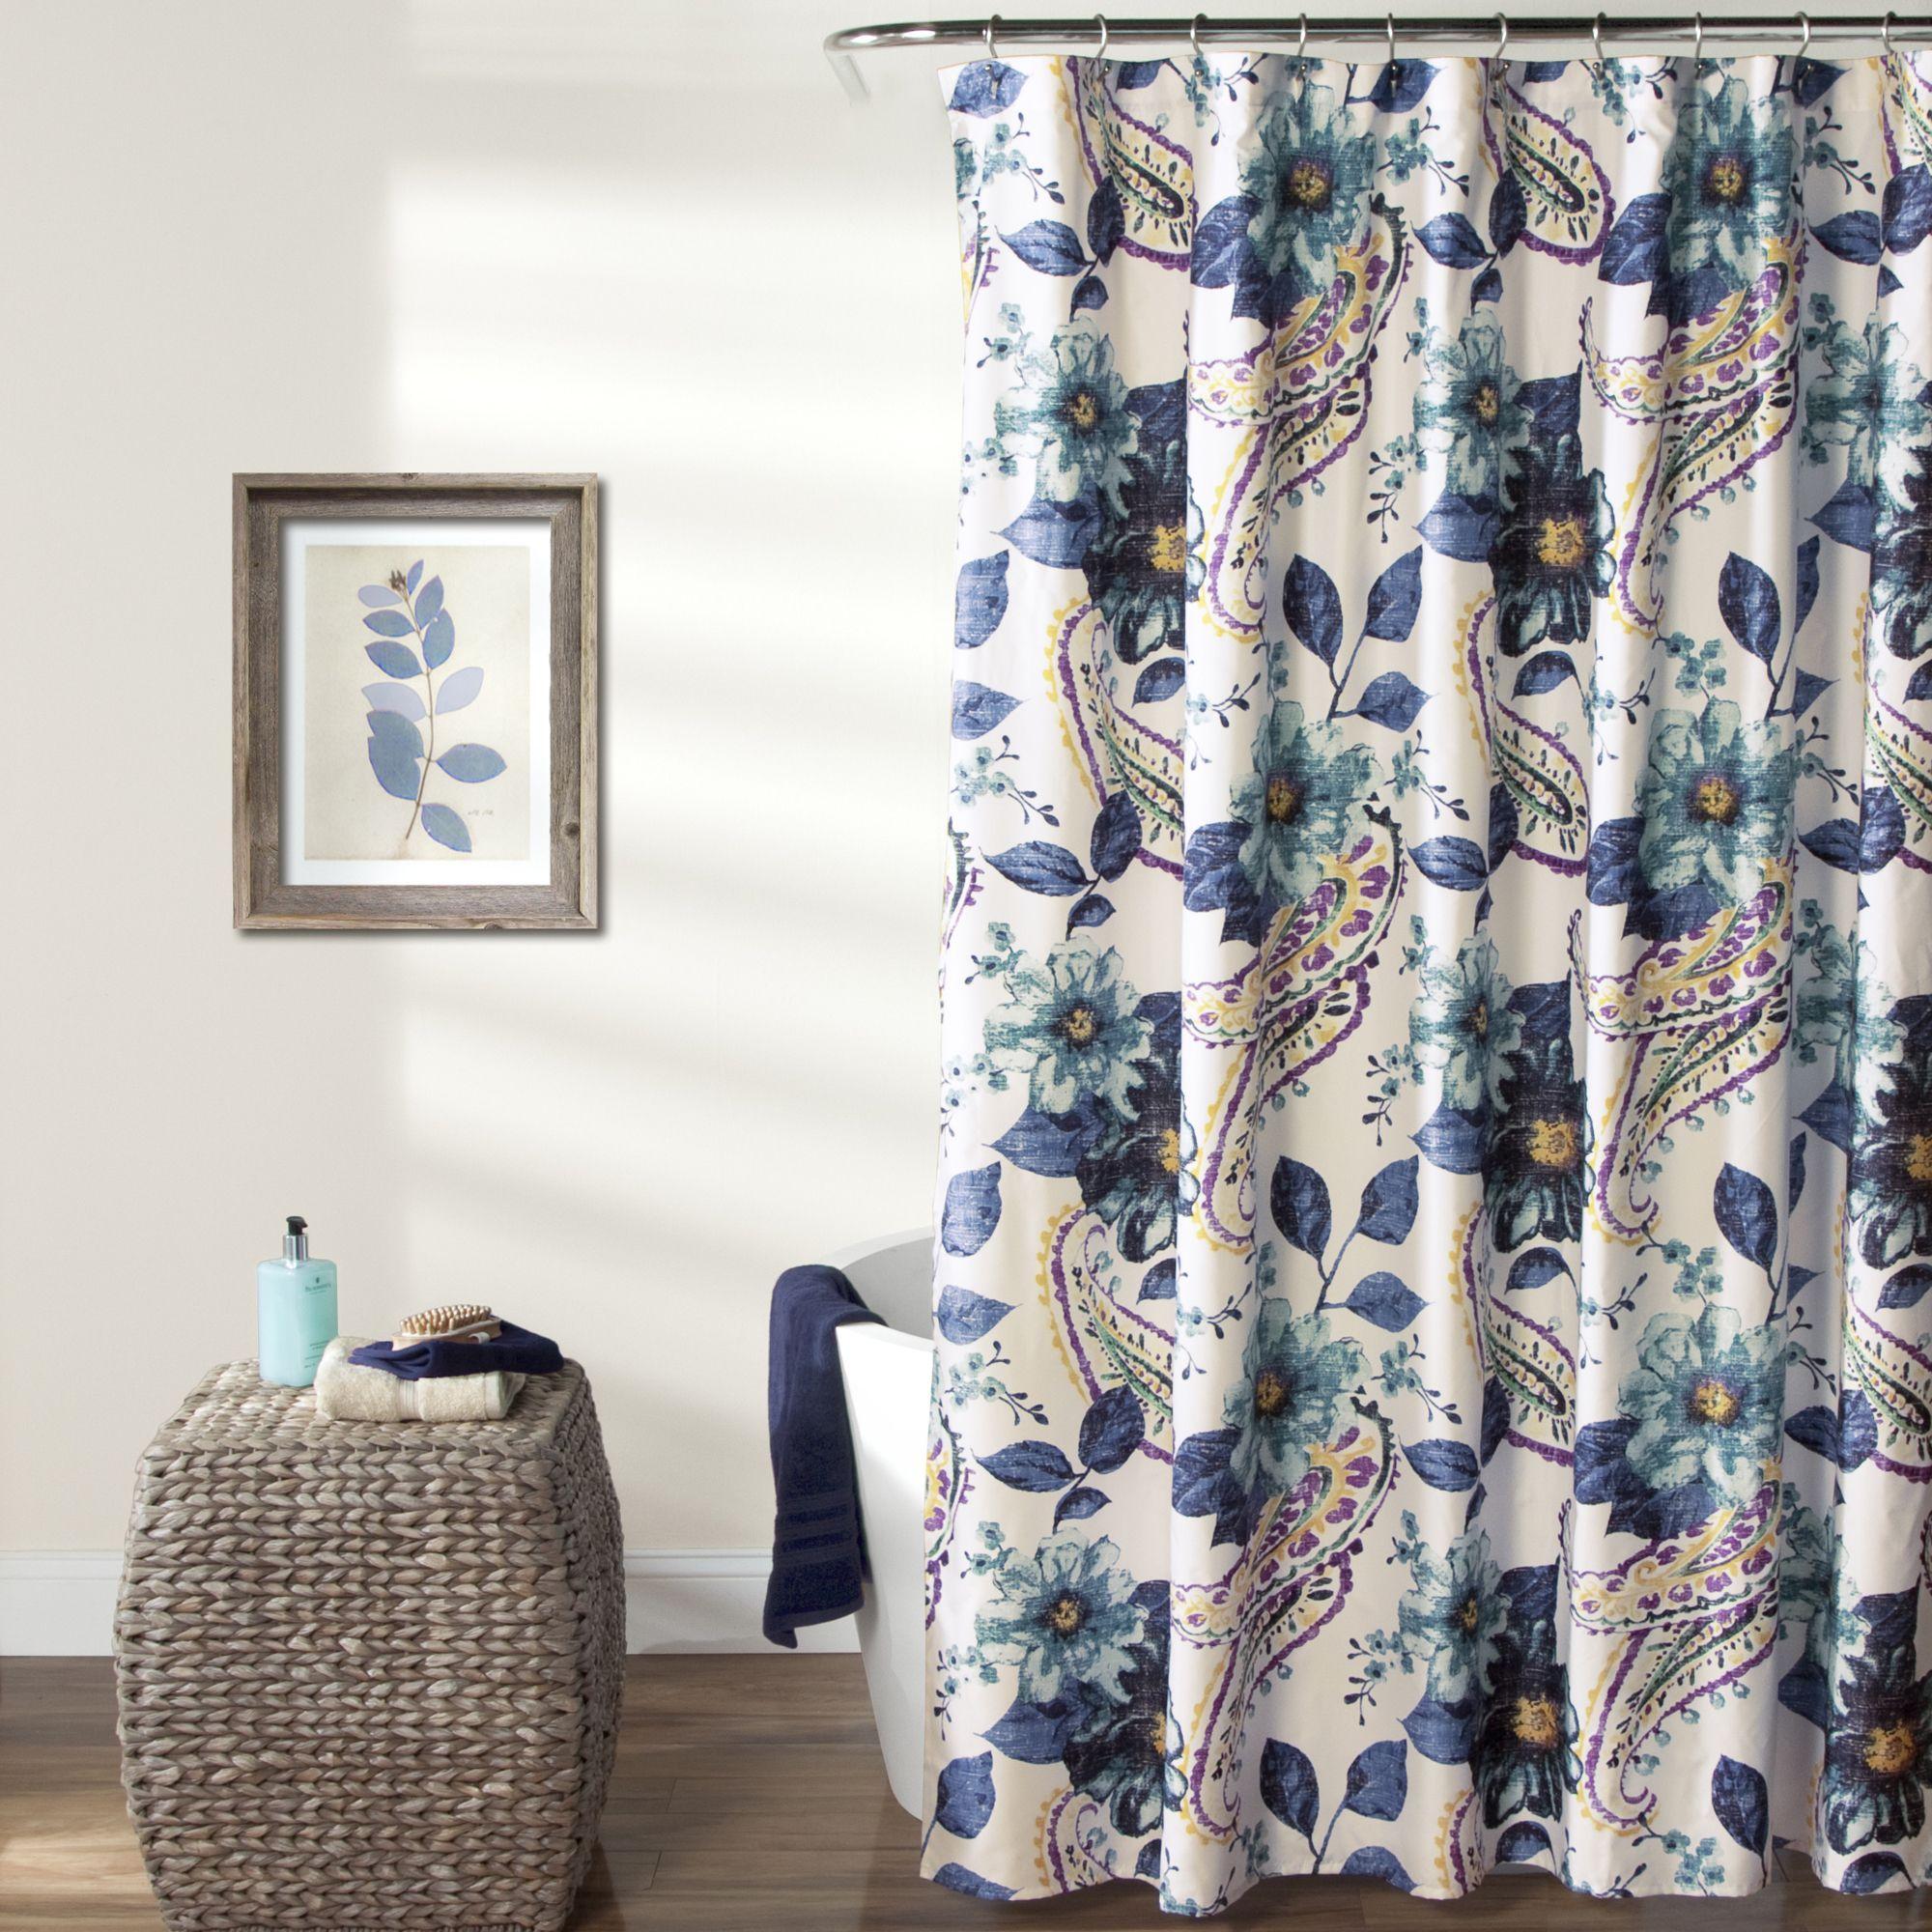 Lush Decor Floral Paisley Shower Curtain By Lush Decor Bathrooms